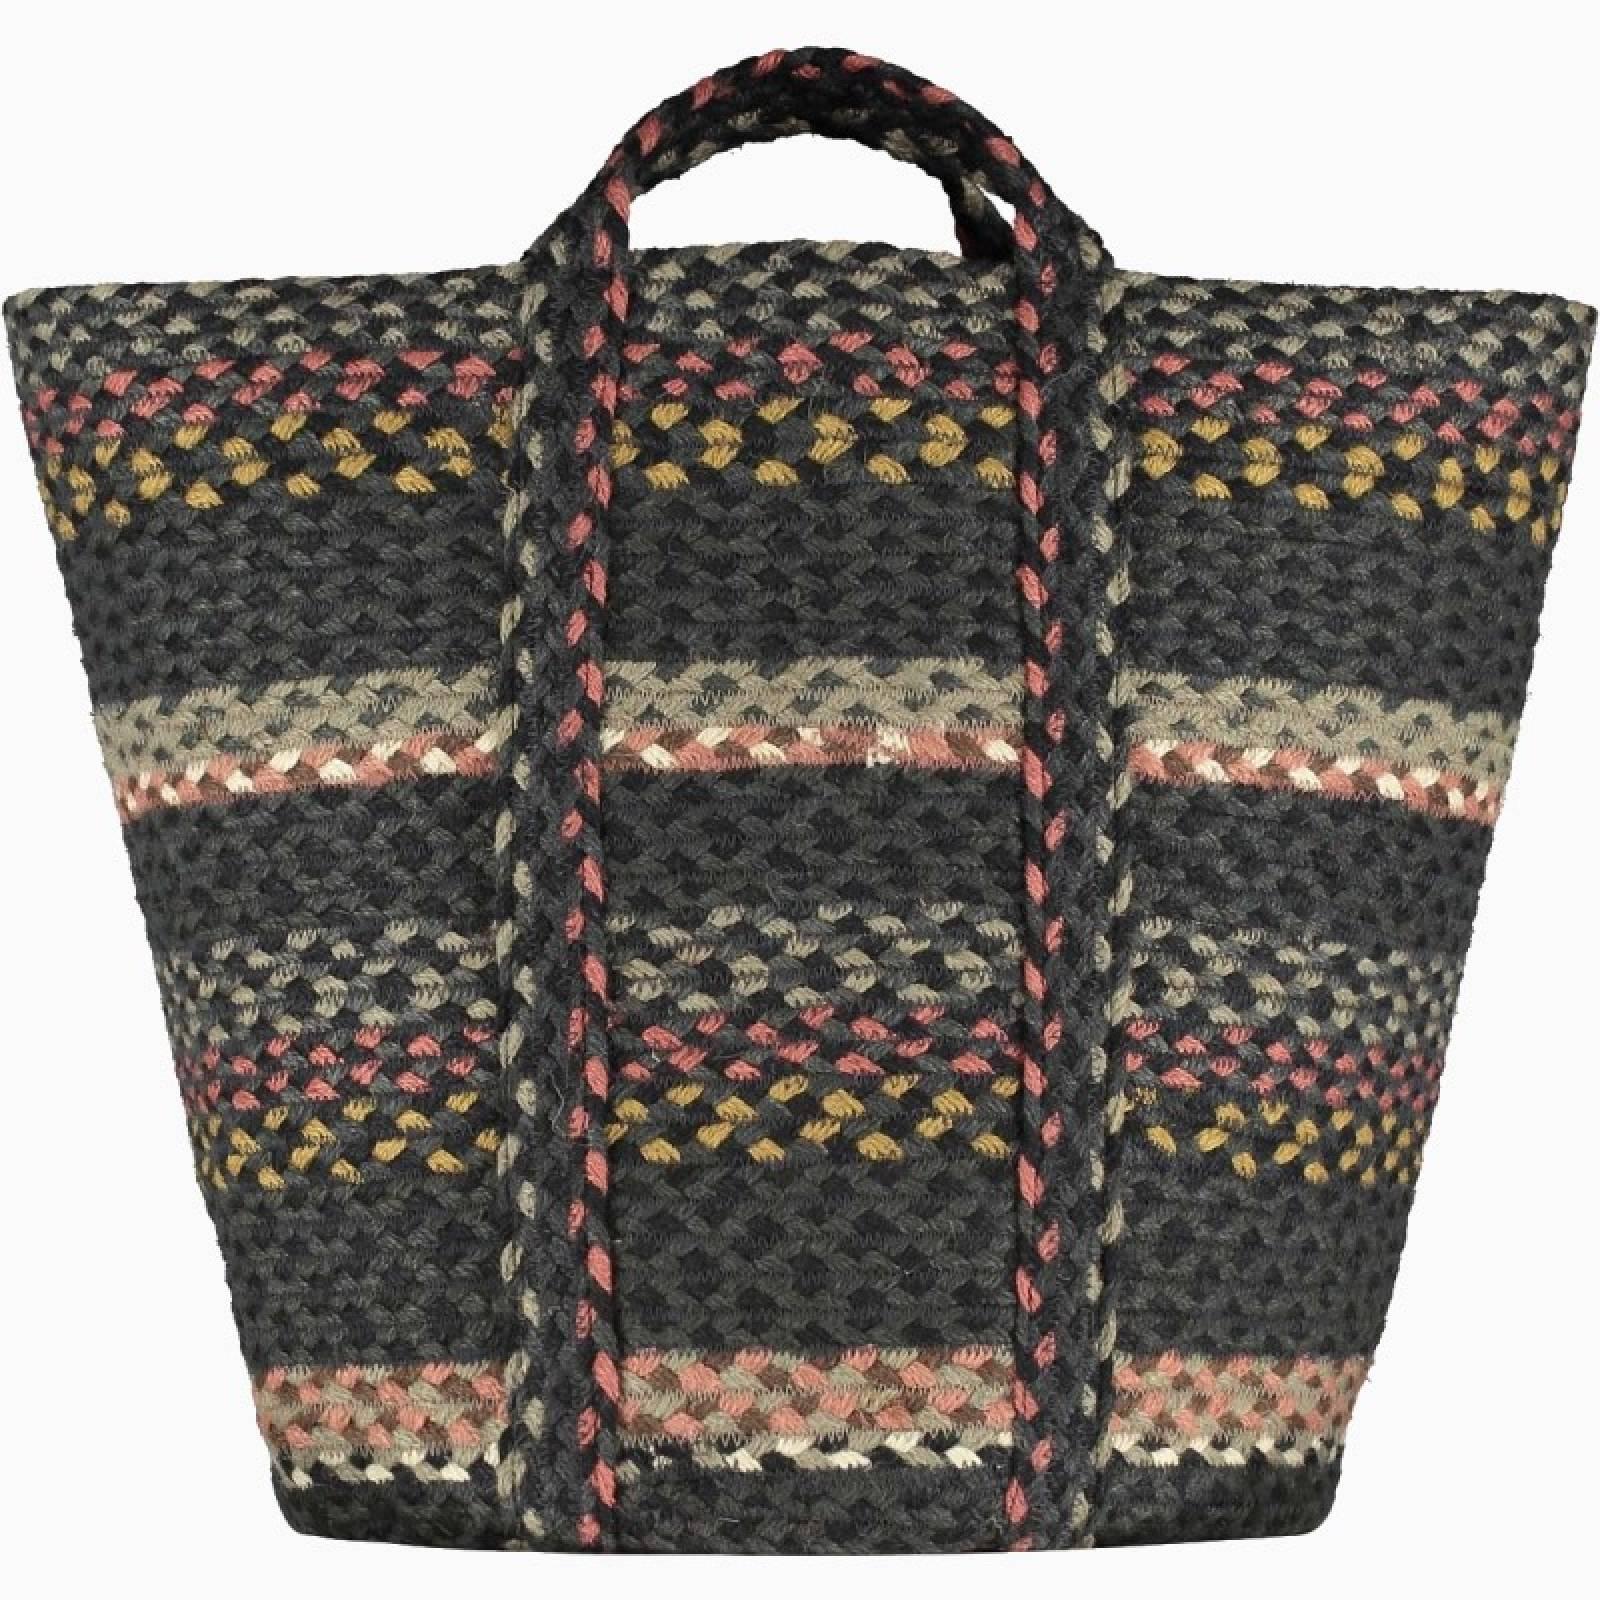 Slouchy Basket In Black Marble 42x47cm